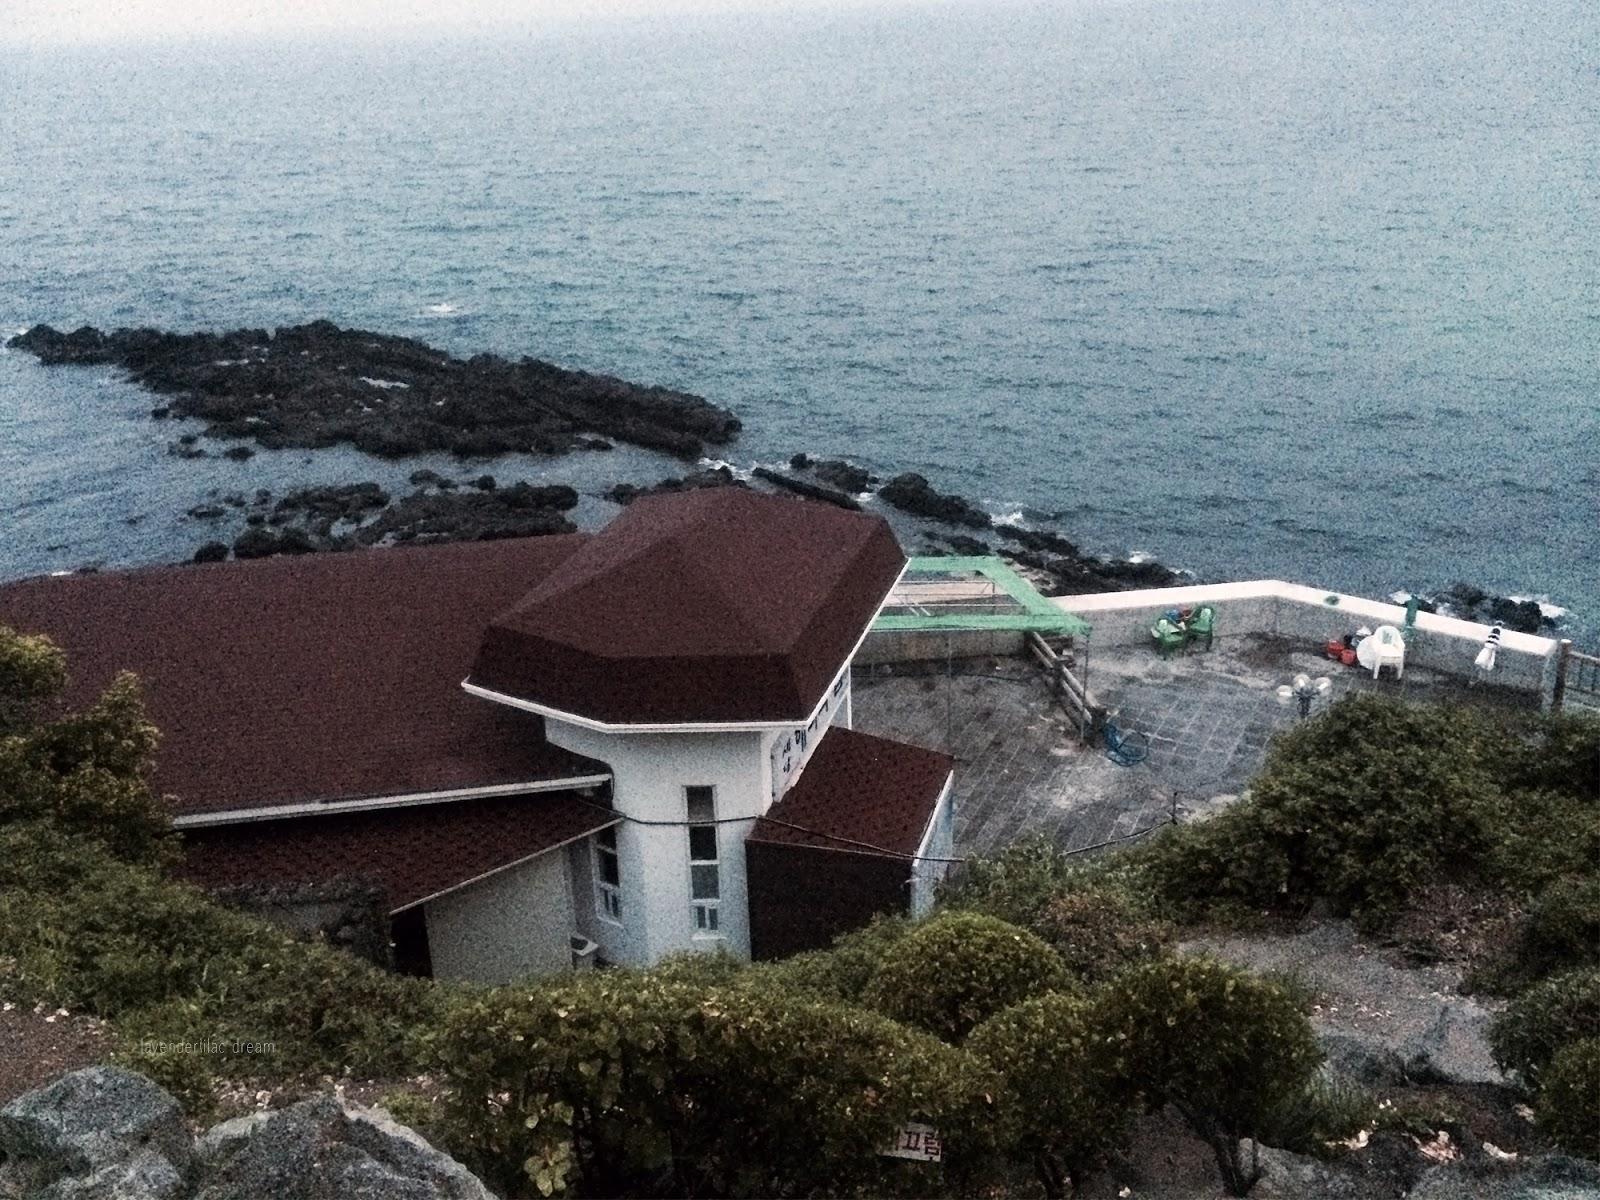 South Korea, Jeju Island